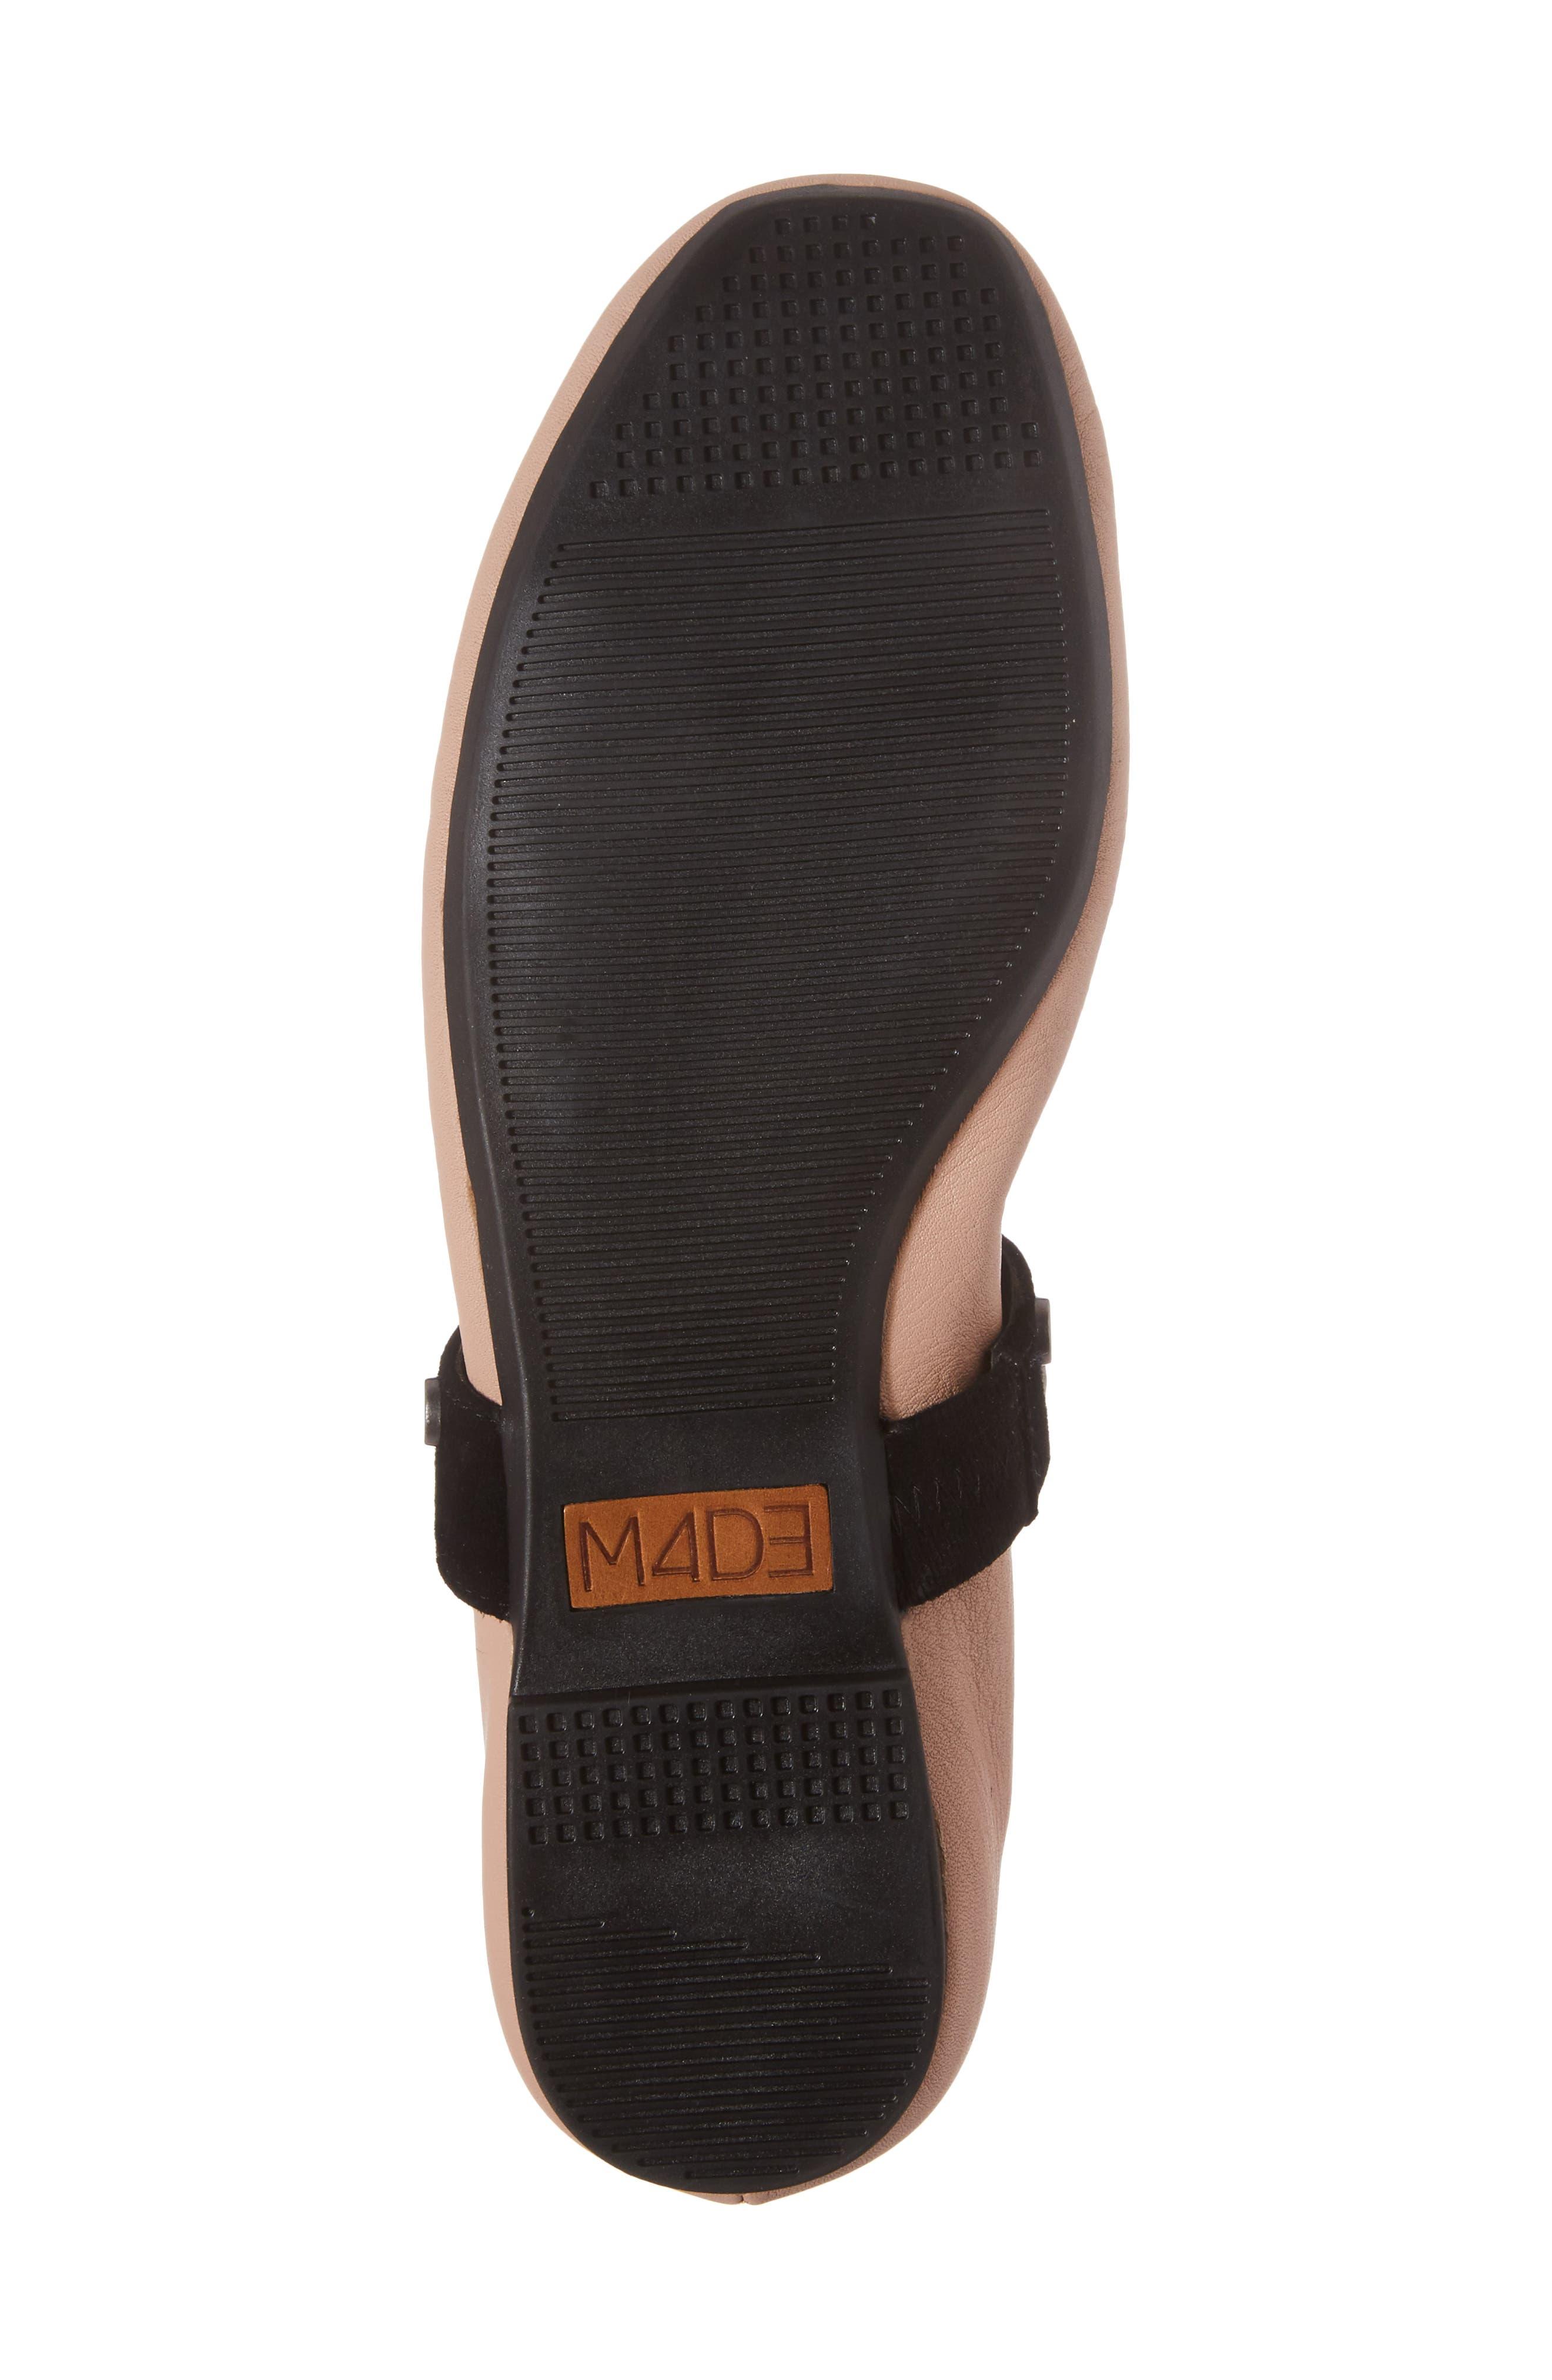 M4D3 Carla Wraparound Ankle Strap Flat,                             Alternate thumbnail 6, color,                             Blush Leather